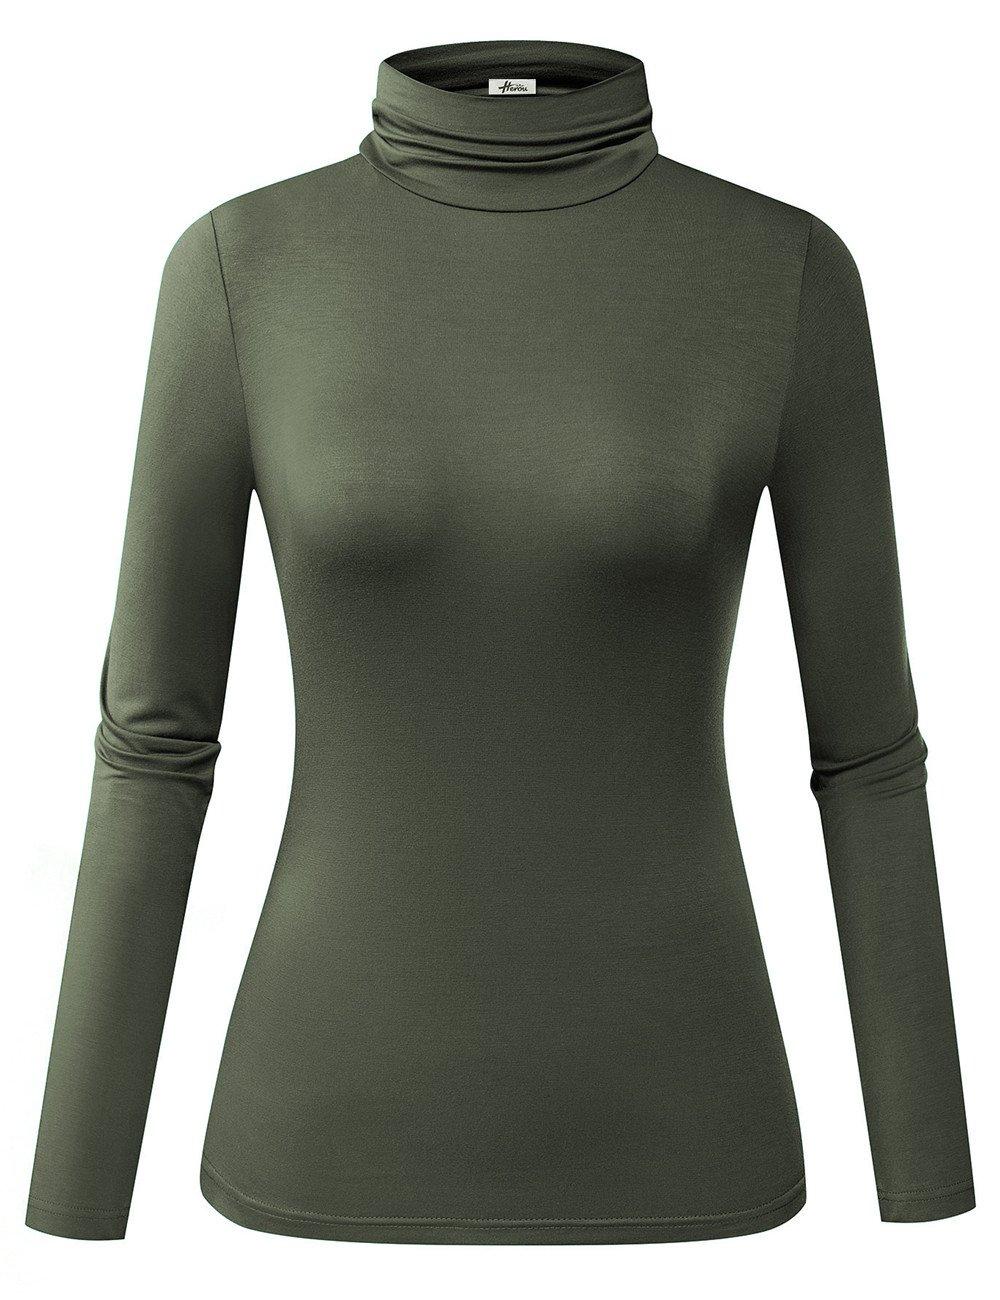 Herou Women Modal Lightweight Long Sleeve Turtleneck Top (Army, Large)